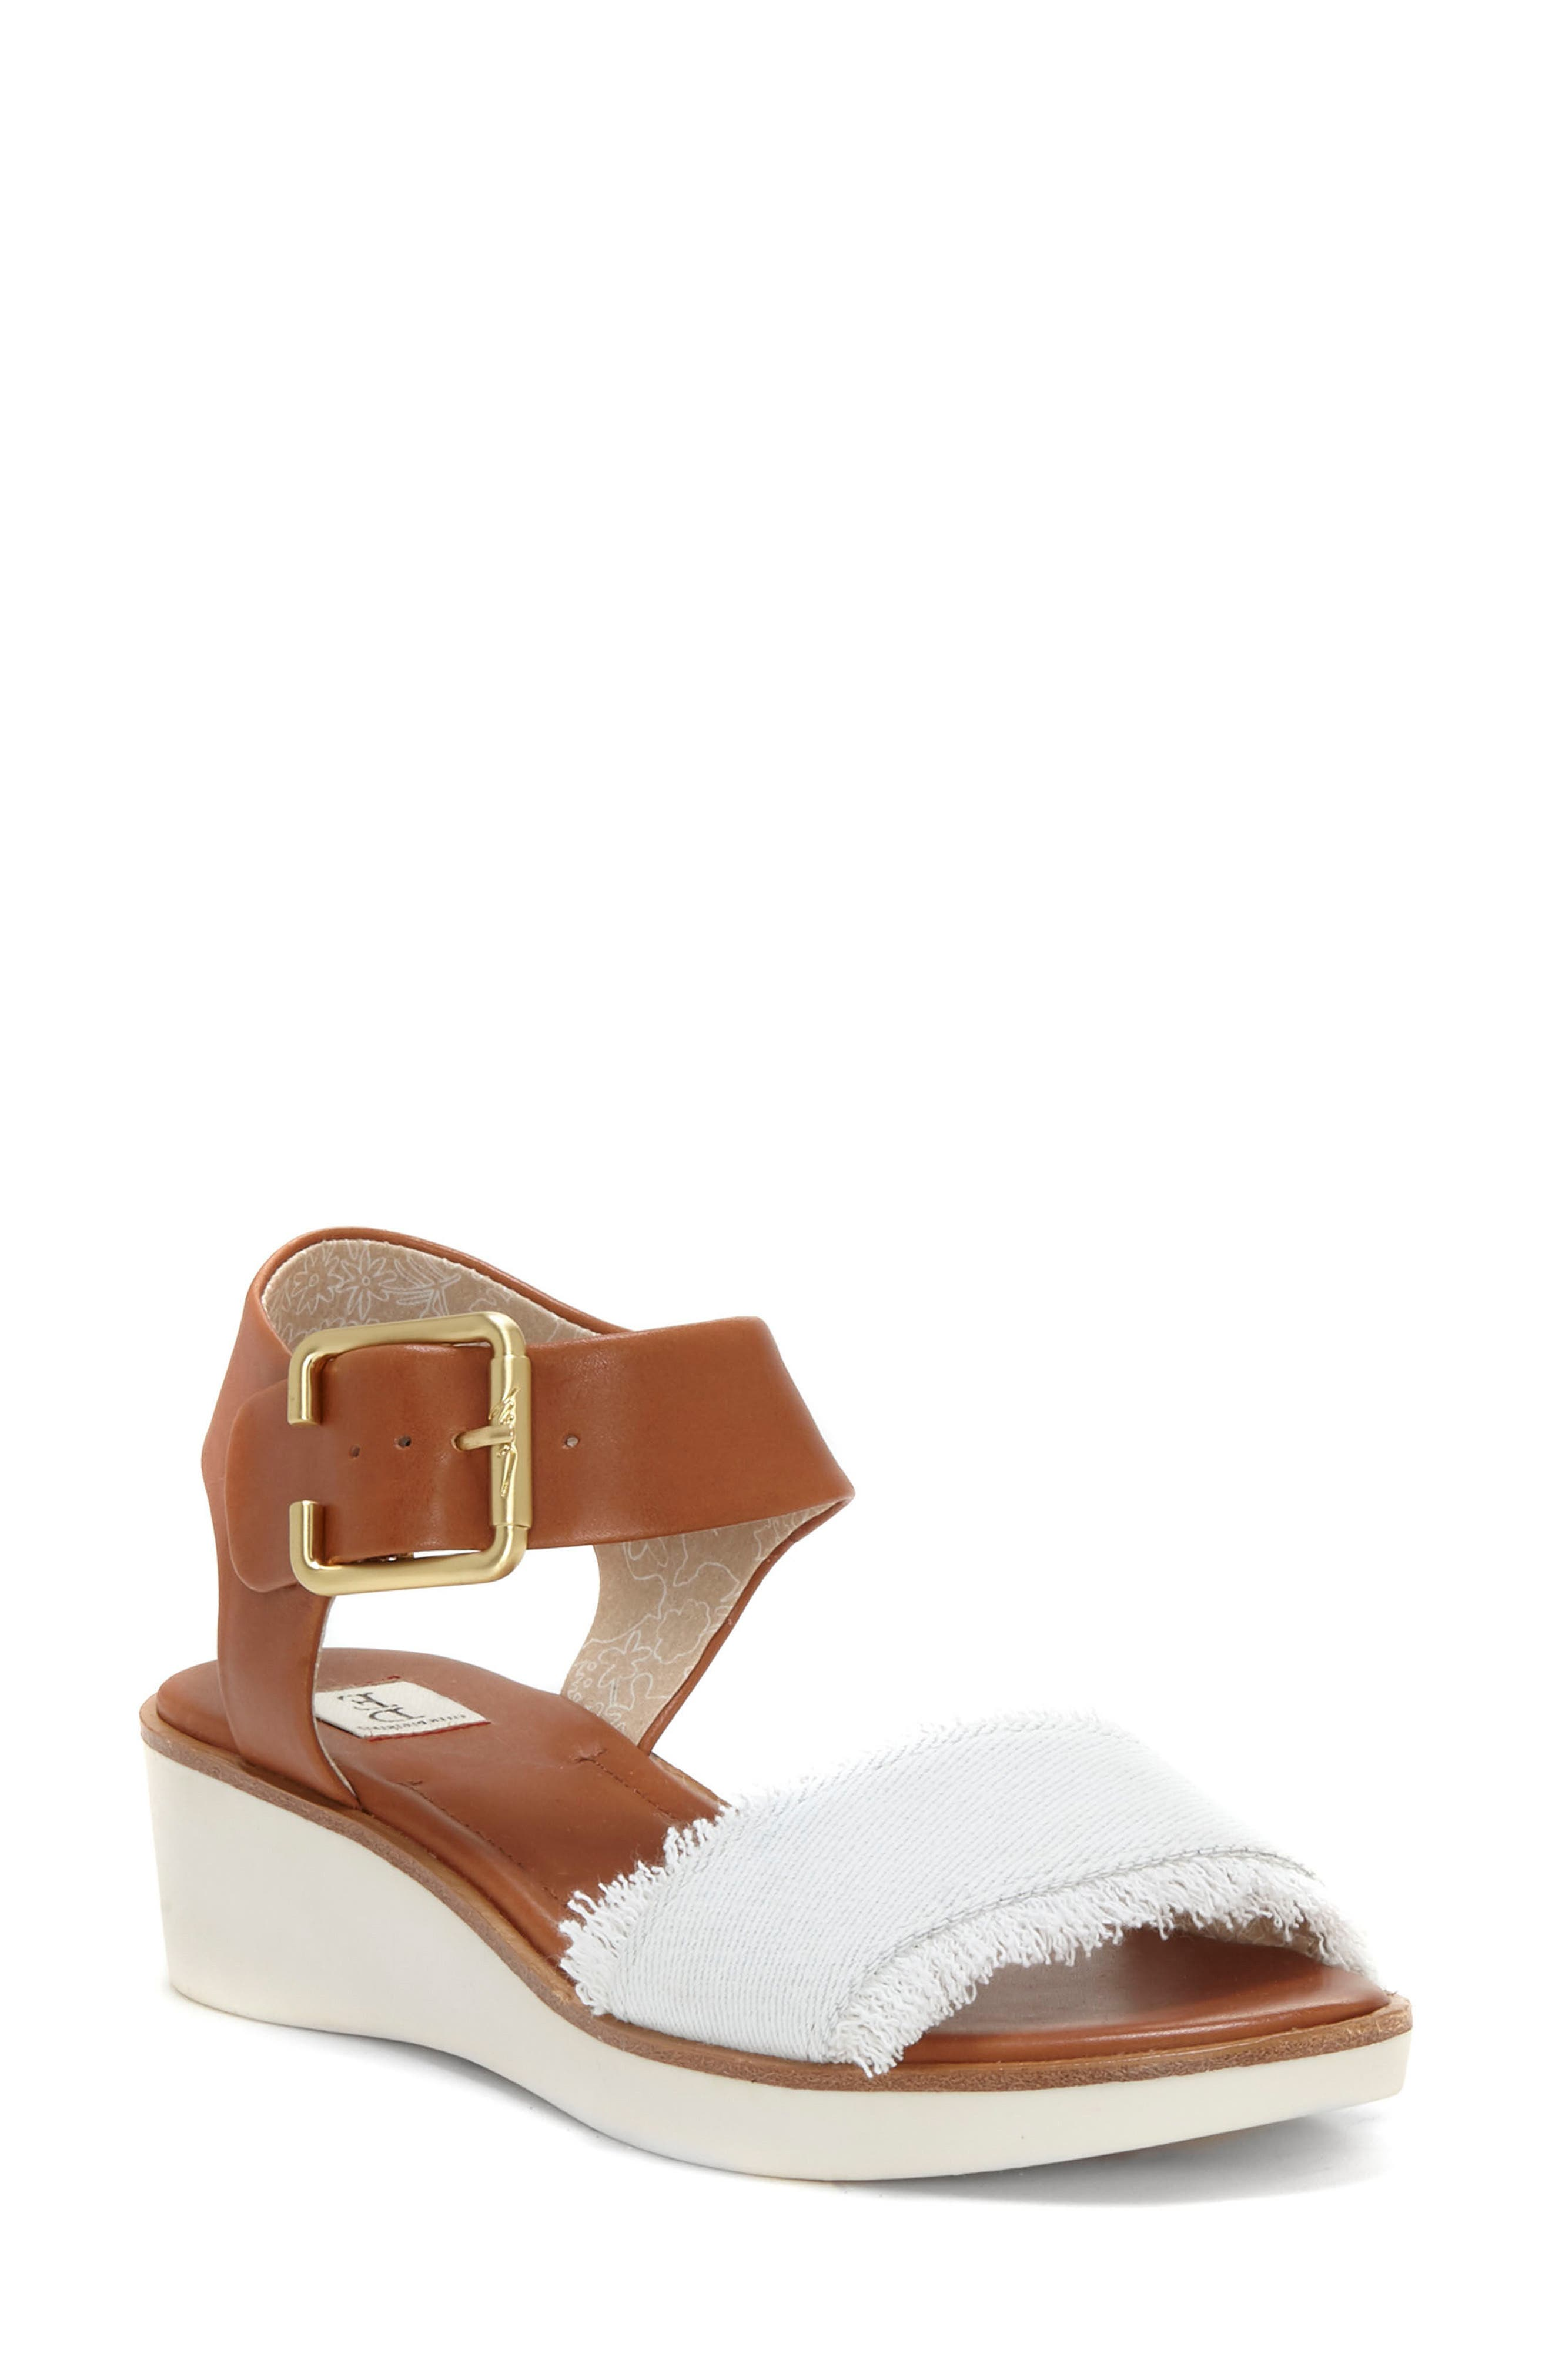 Satiana Sandal,                             Main thumbnail 1, color,                             PURE WHITE DENIM FABRIC